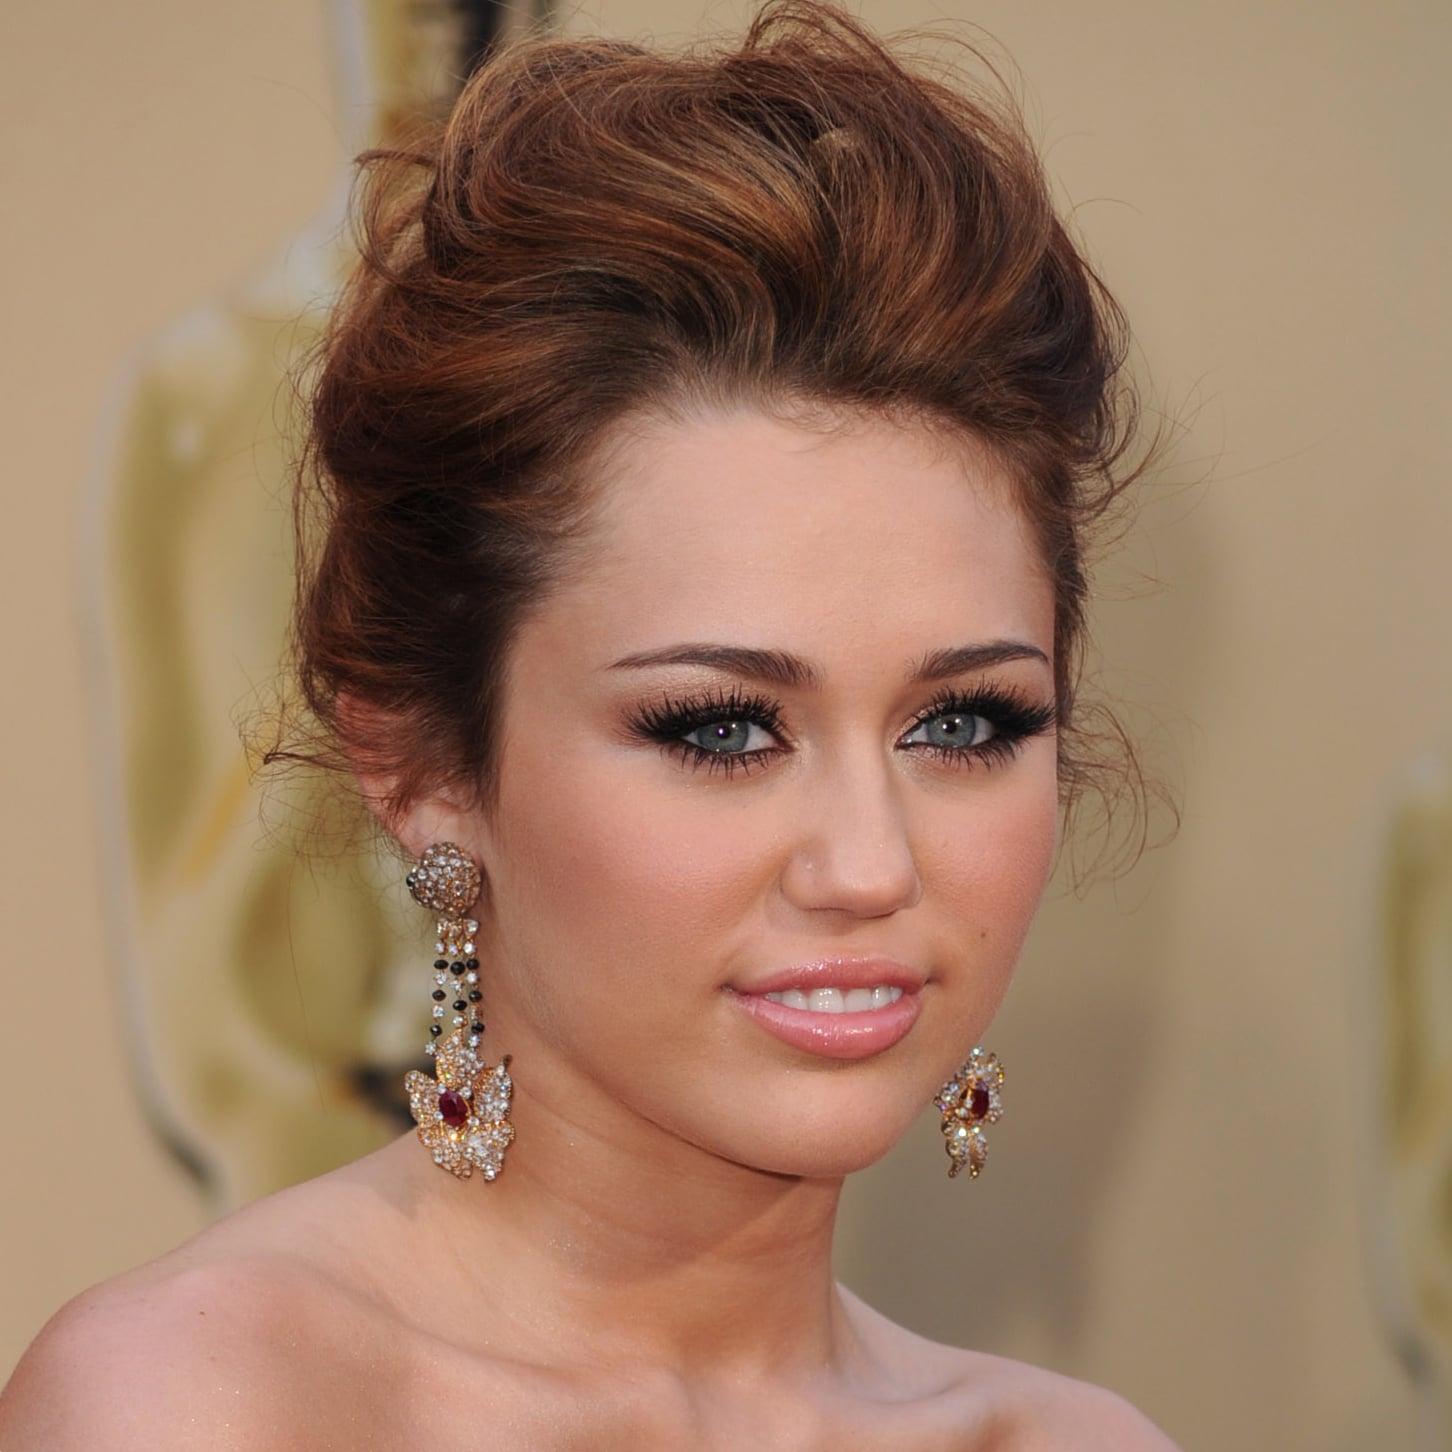 The Best Beauty Looks at the 2010 Oscars | POPSUGAR Beauty Australia